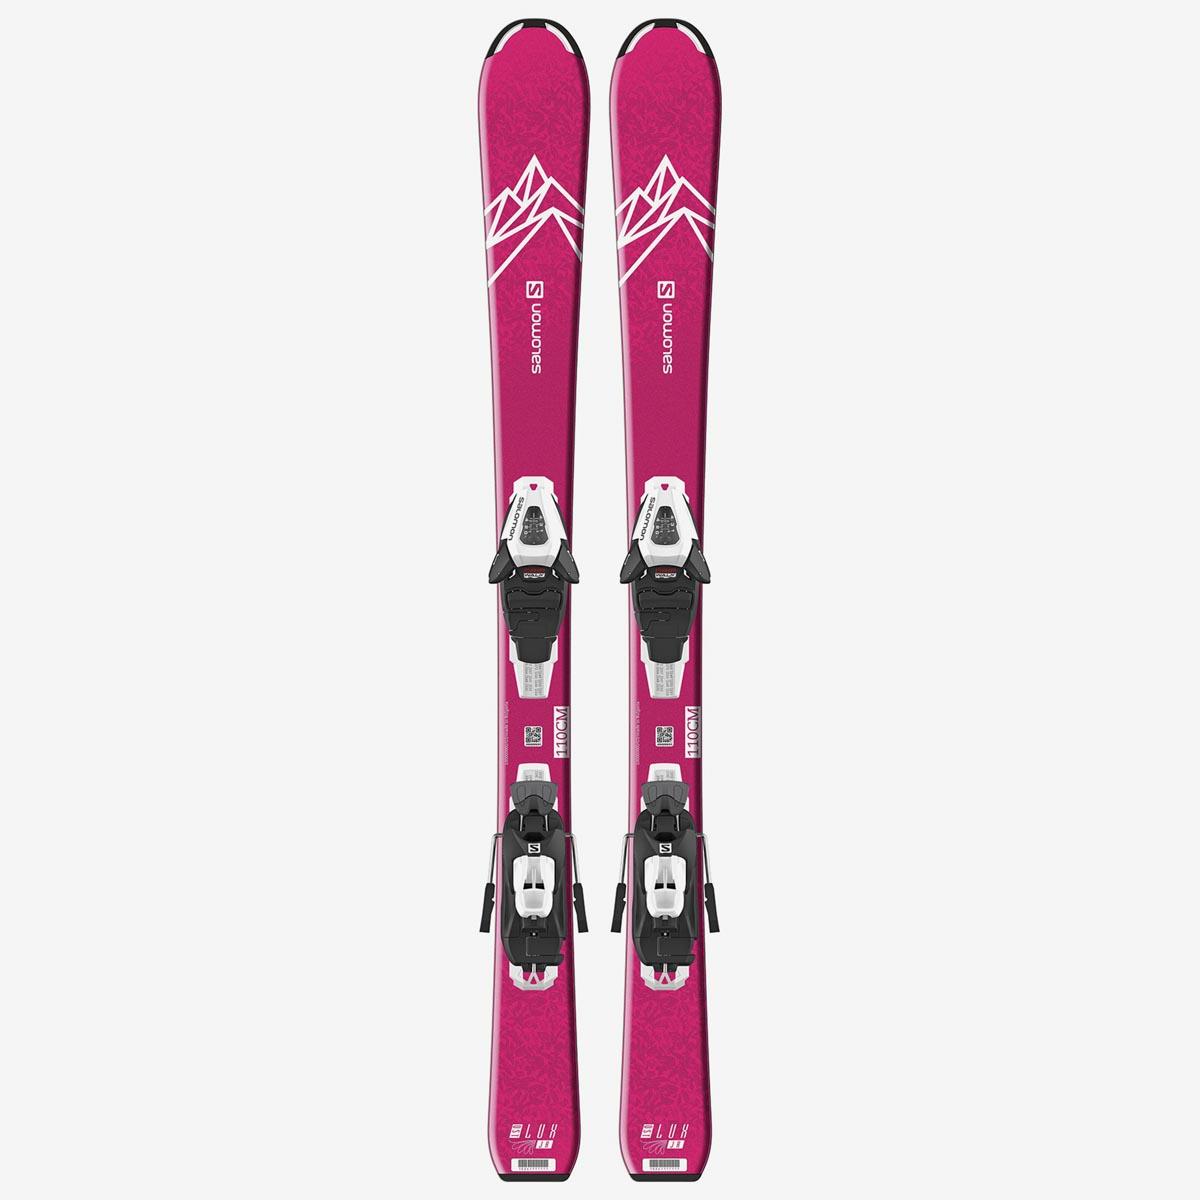 Комплект: лыжи + крепления QST LUX JR S+ C5 GW J75